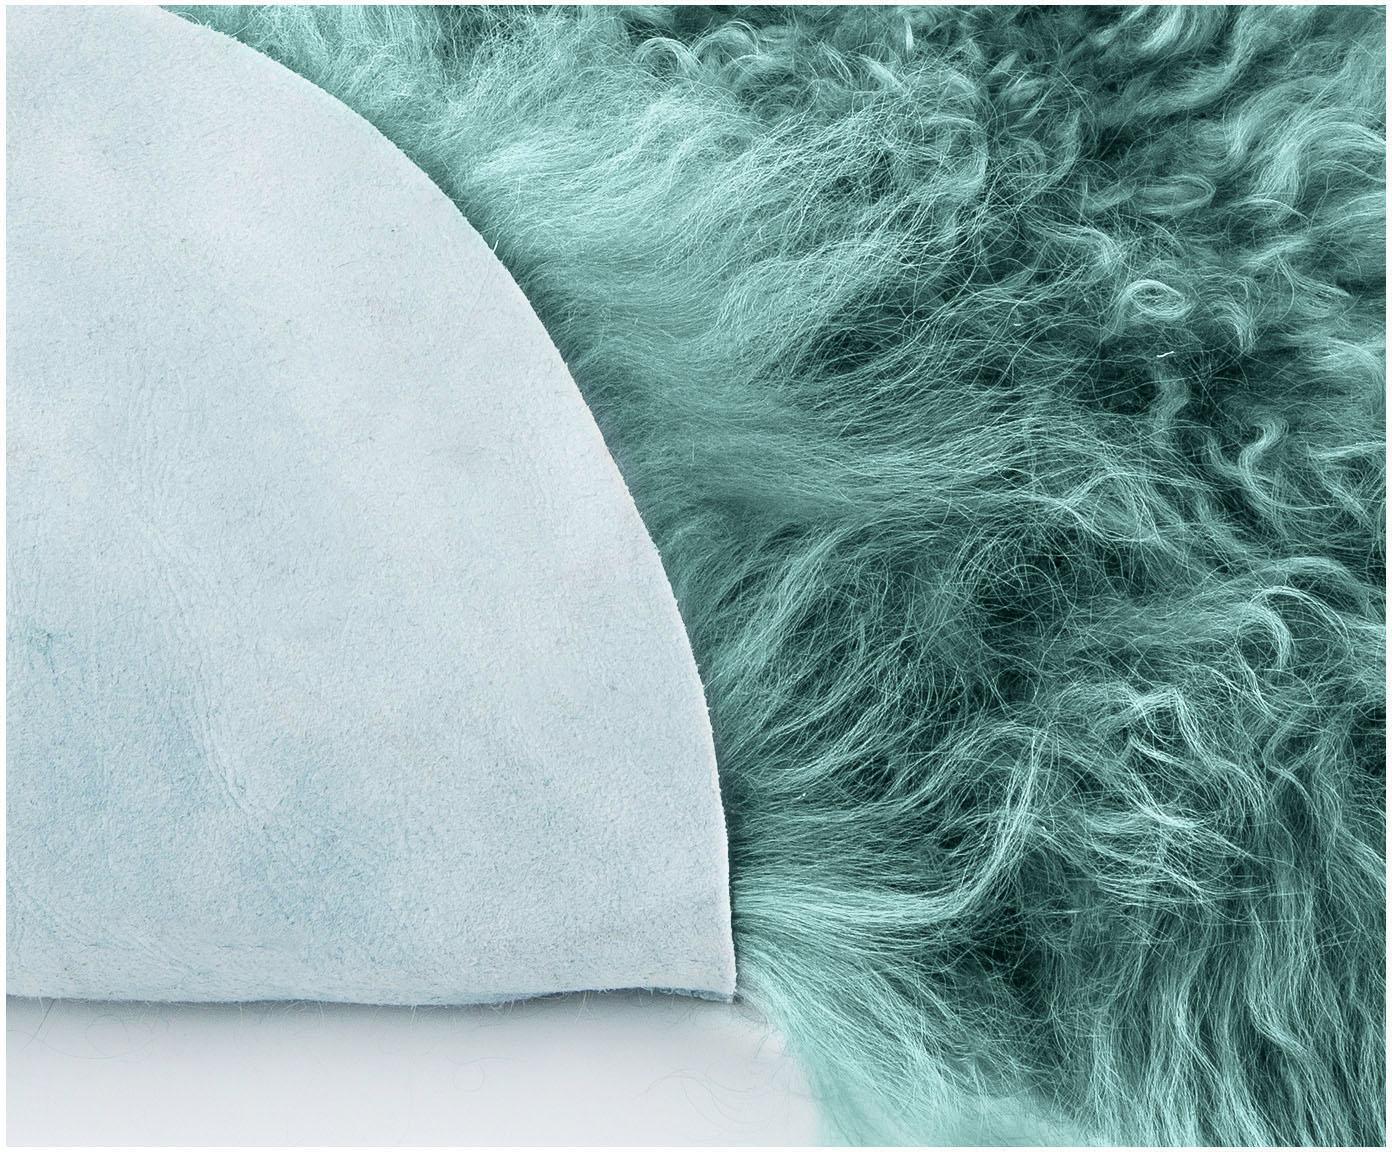 Piel de cordero Ella, Parte superior: 100%piel de cordero de M, Reverso: 100%cuero, Turquesa oscuro, An 50 x L 160 cm